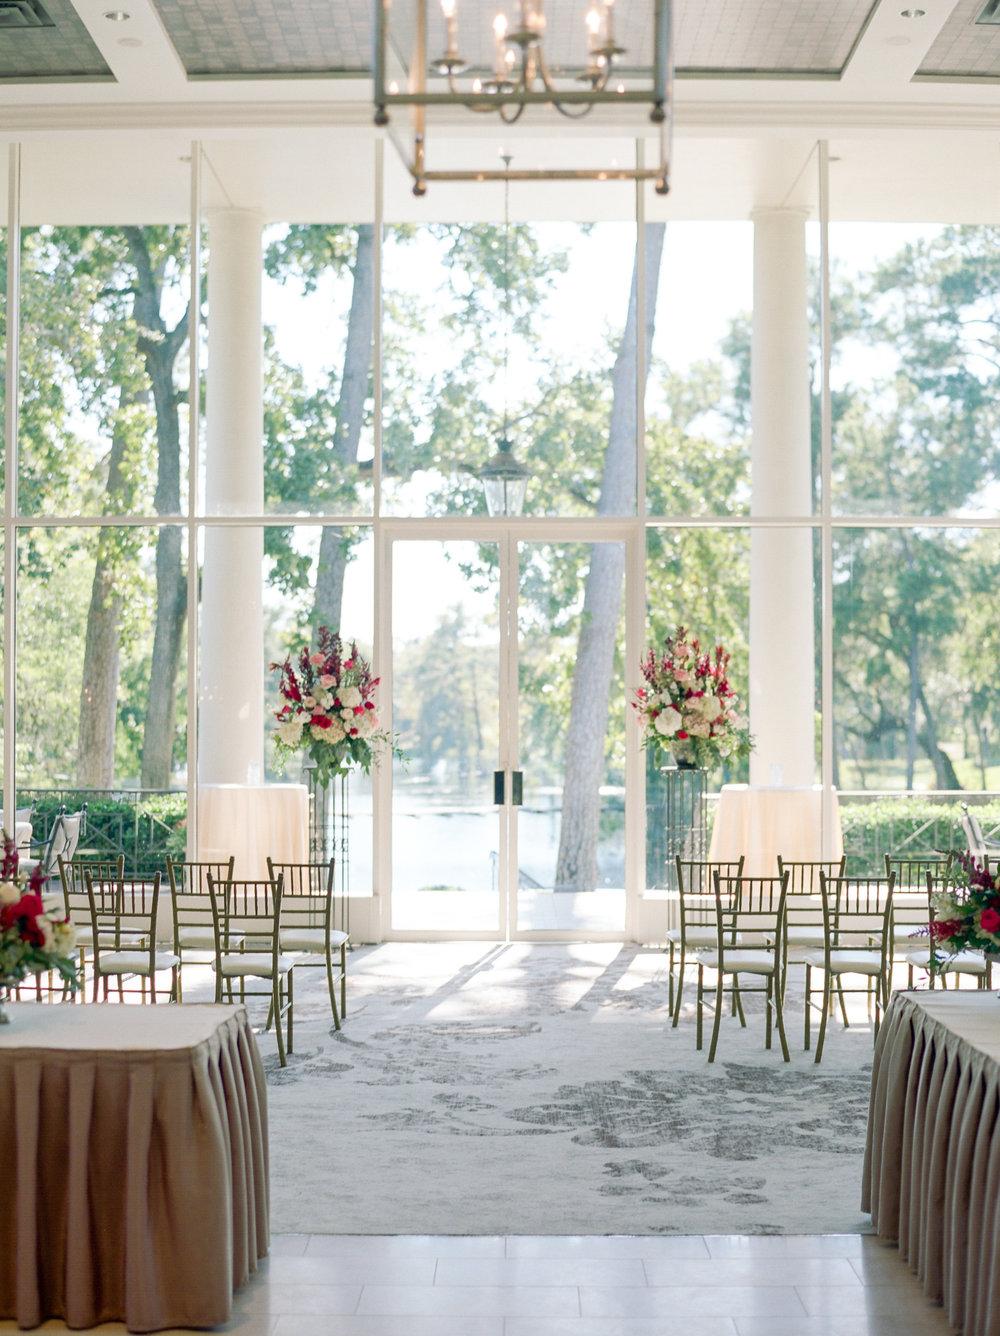 Houston-Wedding-Photographer-Lakeside-Country-Club-First-Look-Bride-Groom-Formals-Film-Fine-Art-Photography-26.jpg